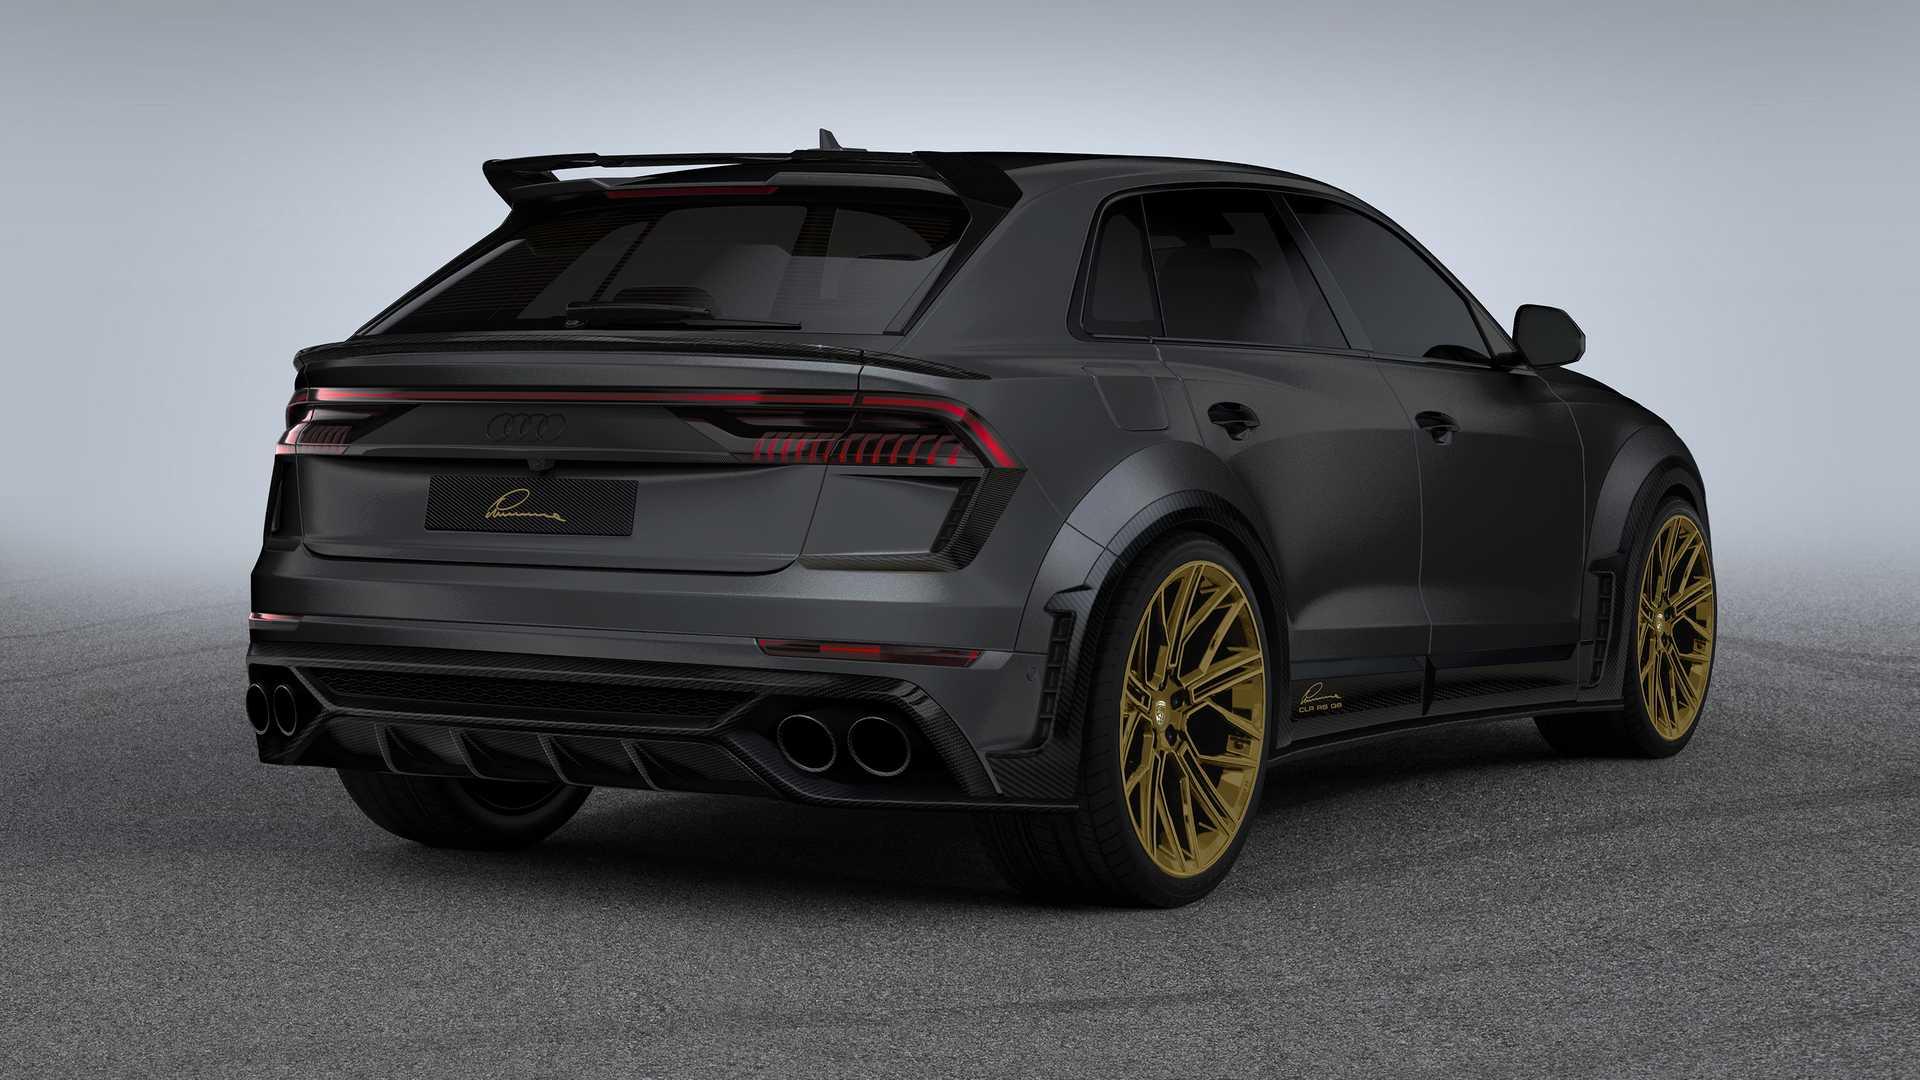 Audi-RS-Q8-CLR-8-RS-By-Lumma-Design-8